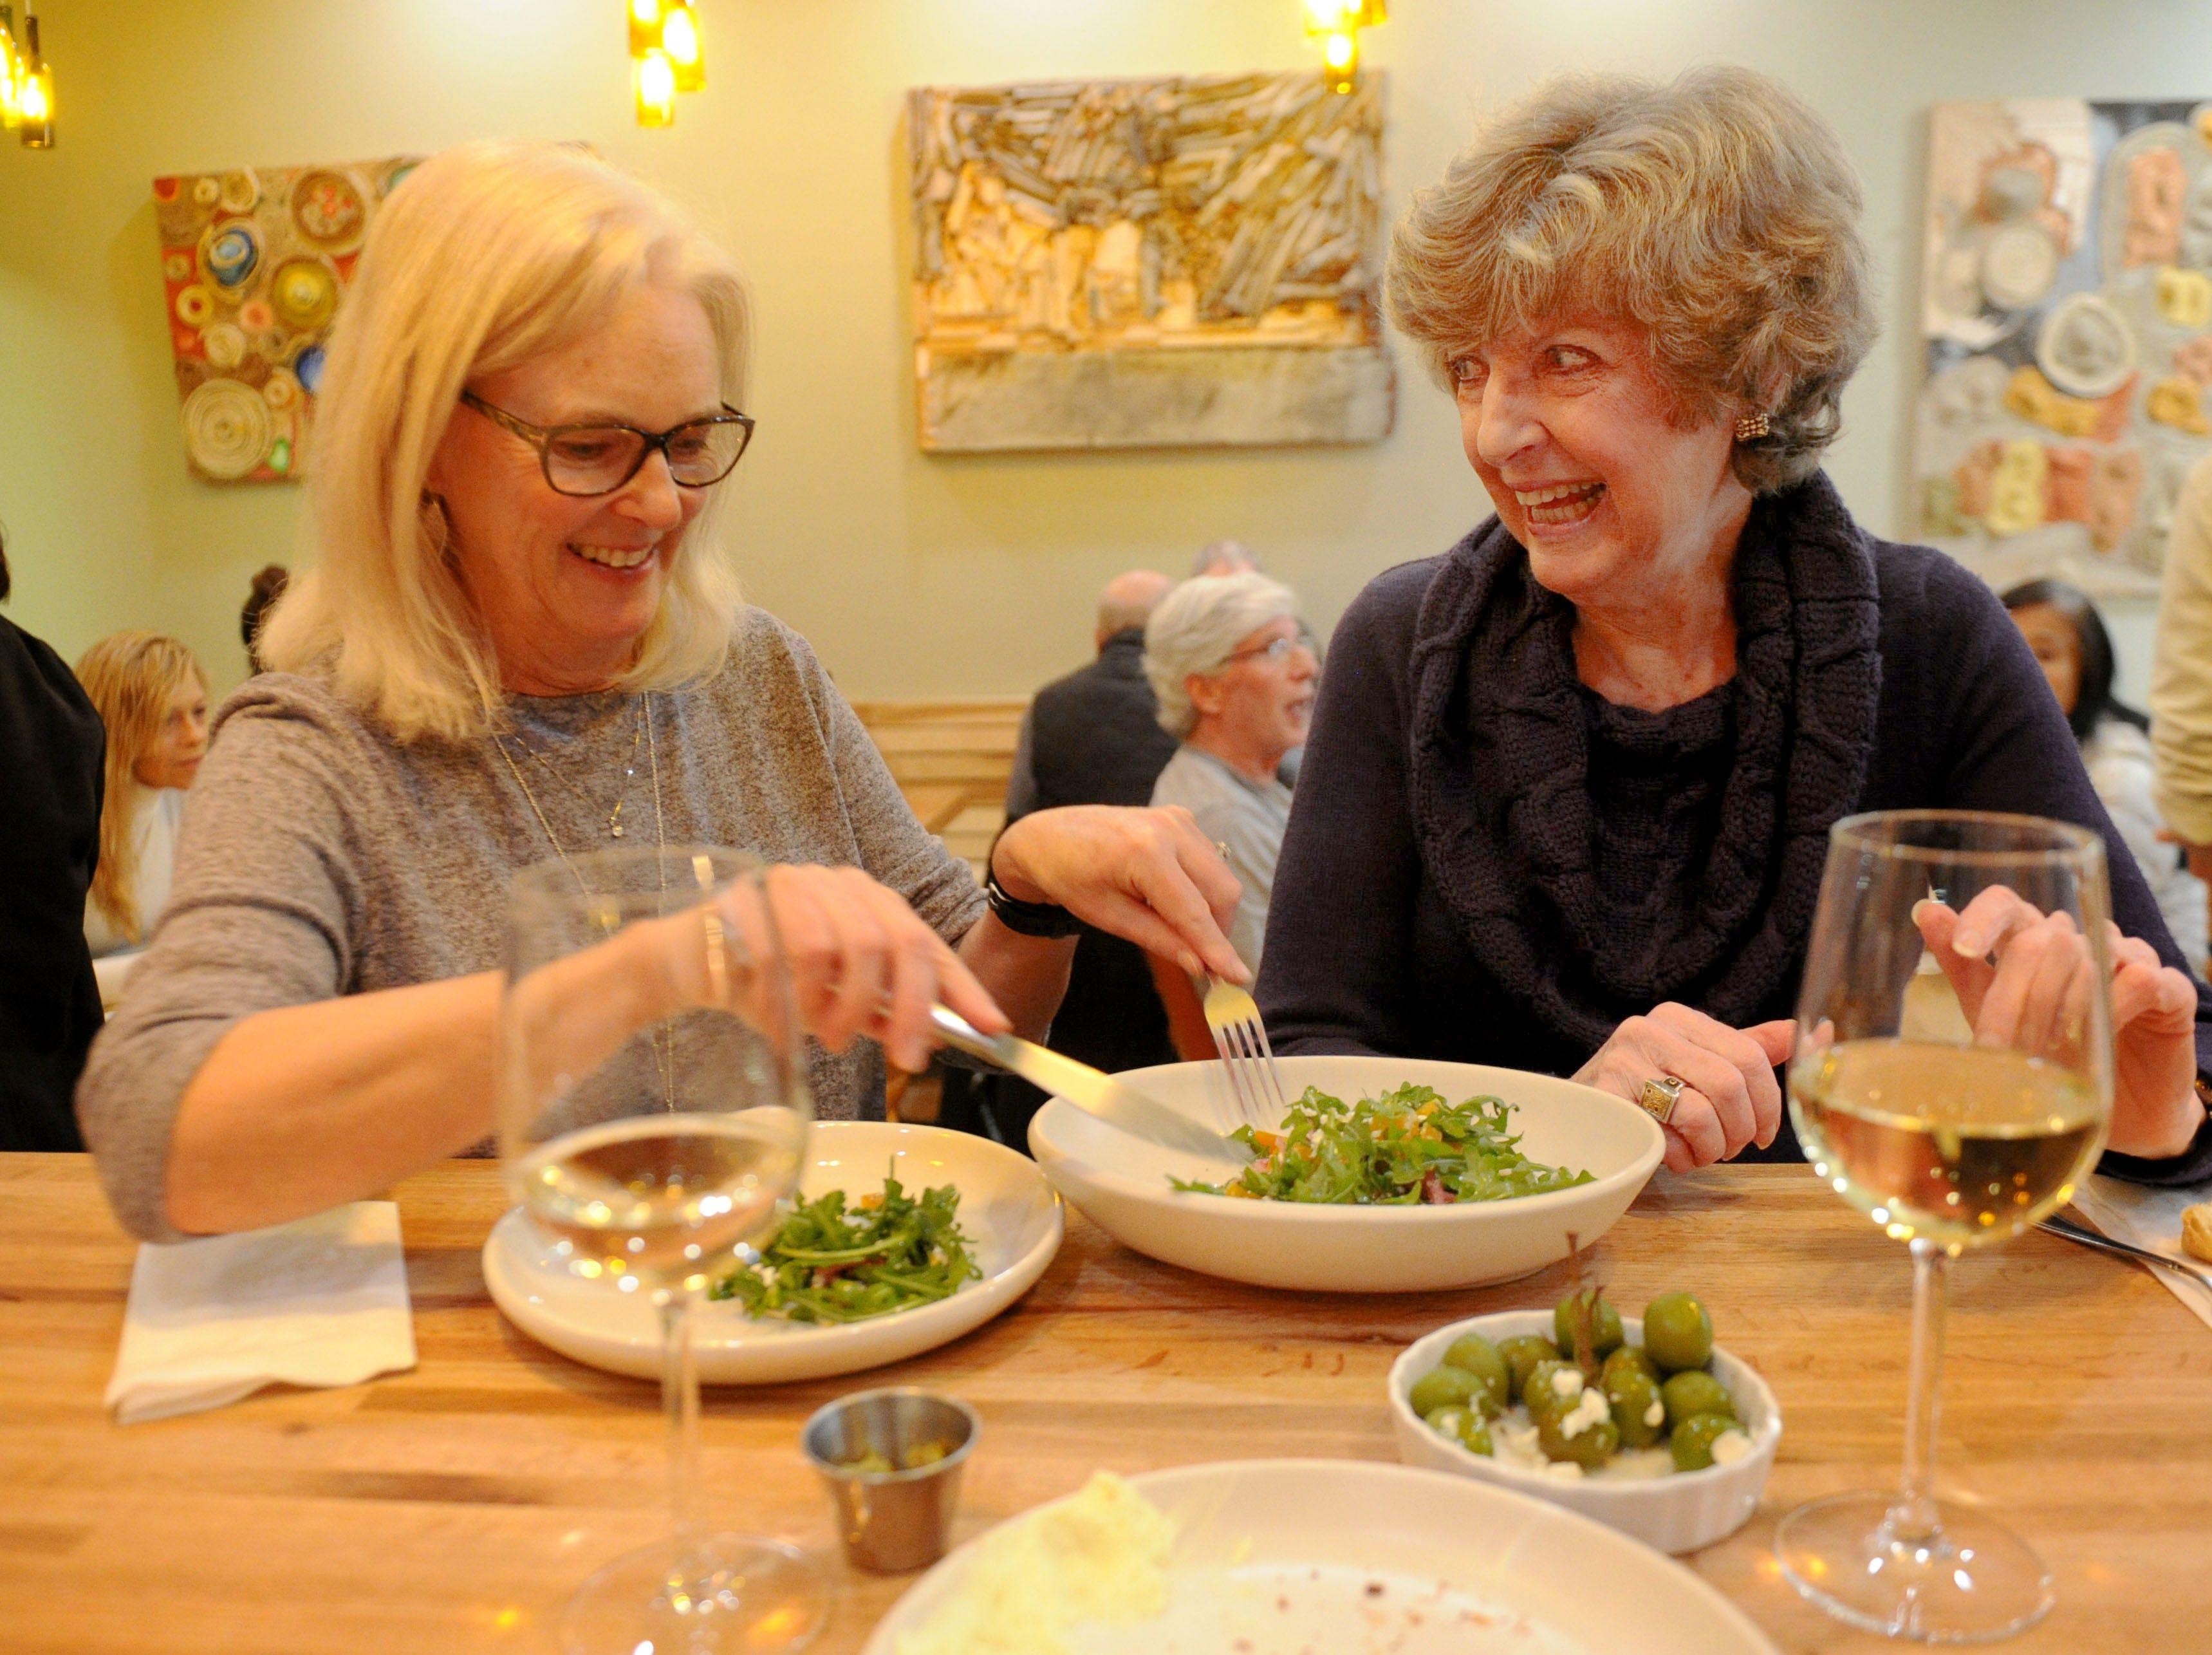 Susan Bevan, left, and  friend Carole Gordon share the roasted beet salad at the Decker Kitchen in Westlake Village.